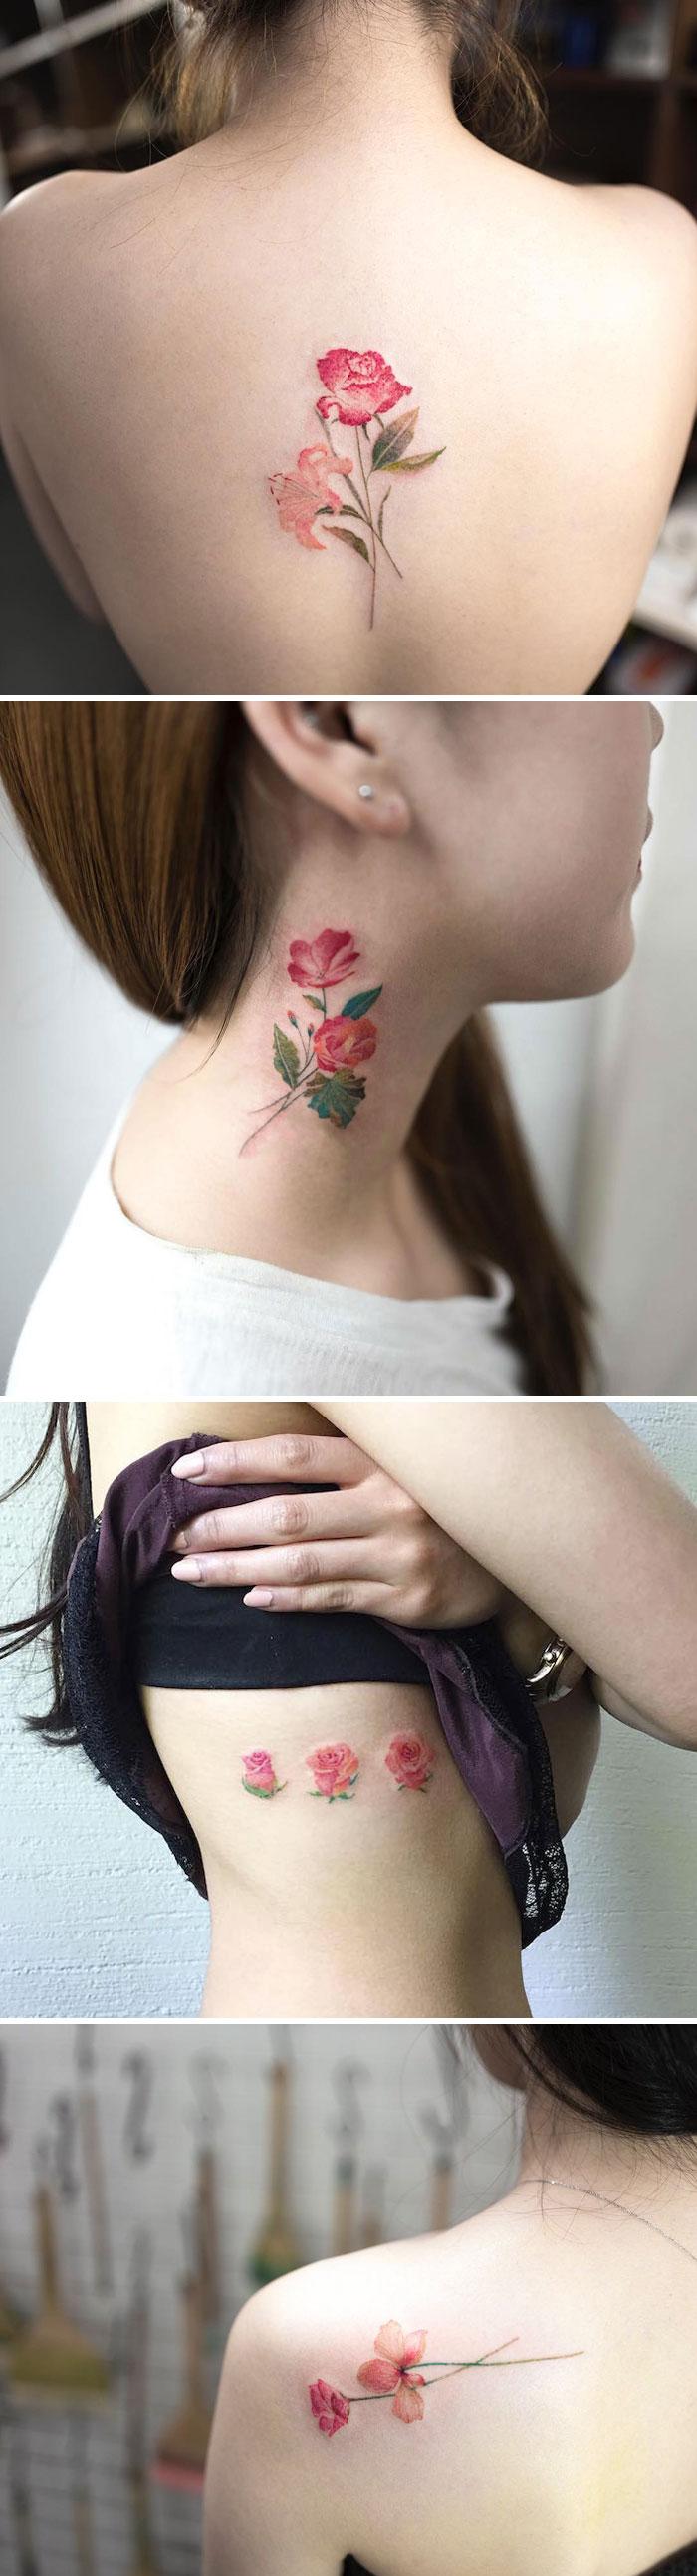 tatuagens-florais (9)